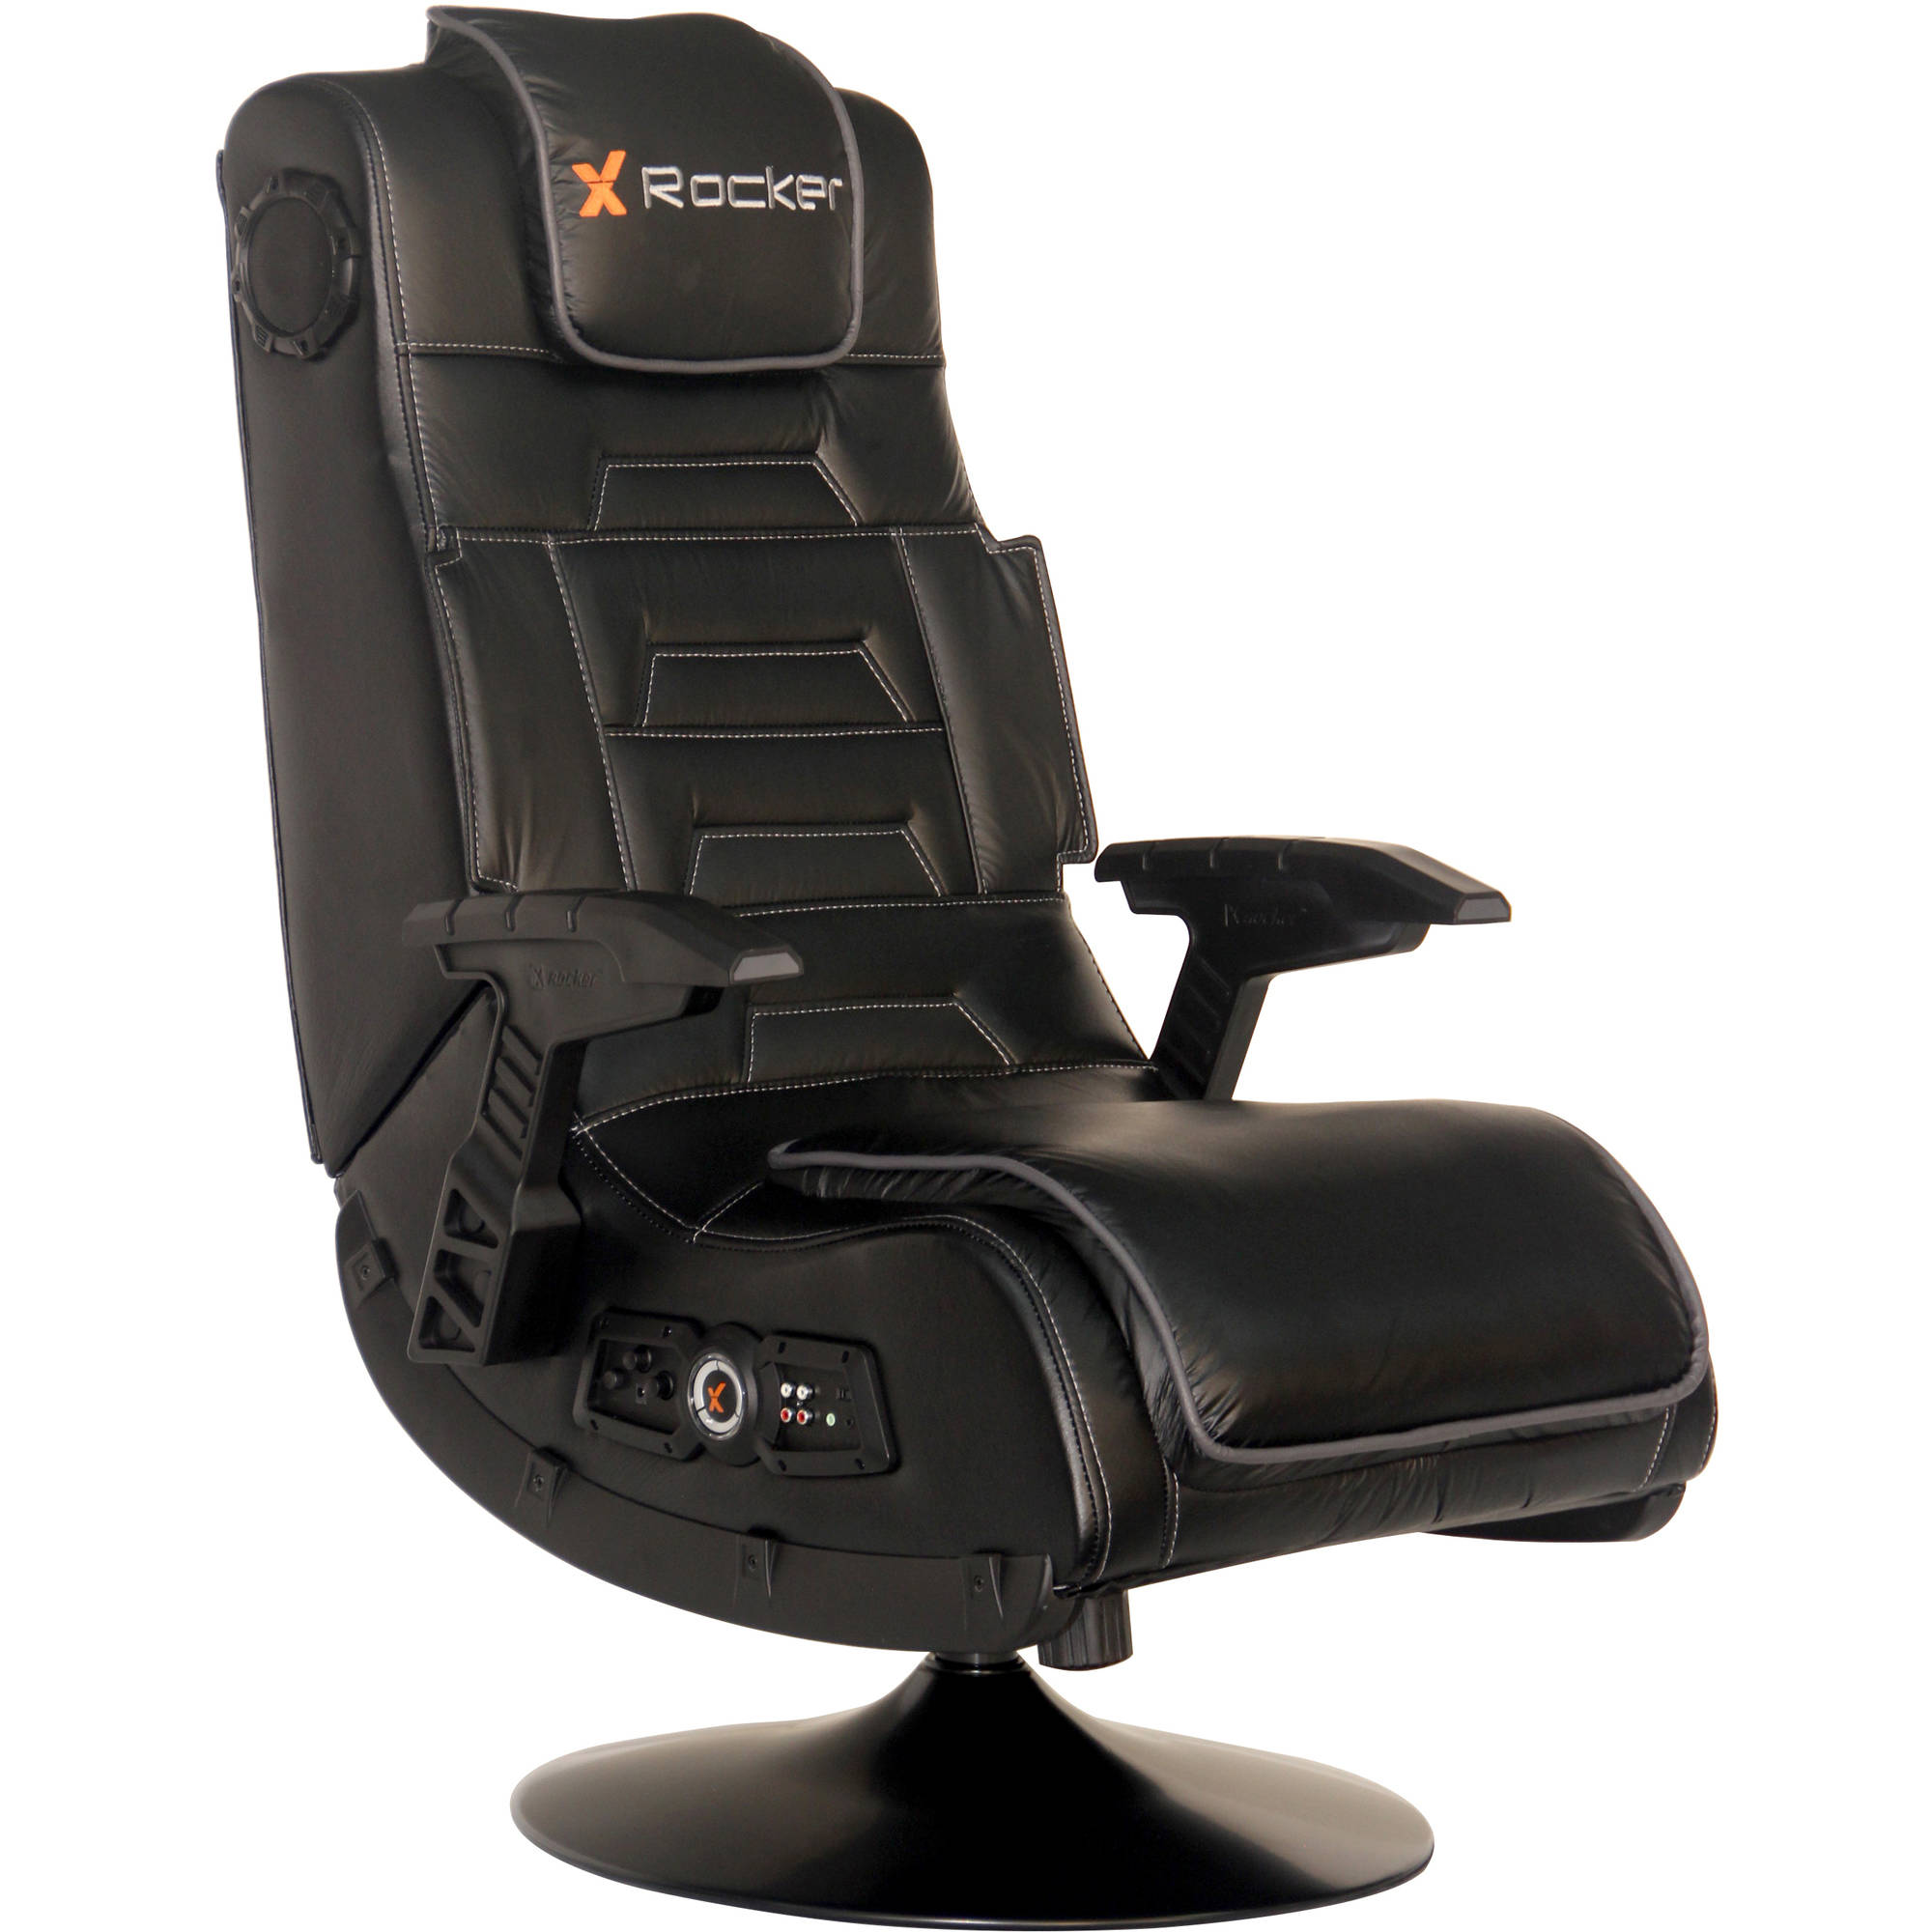 X Video Rocker Pro Series Pedestal 2.1 Wireless Audio Gaming Chair, Black, 51396